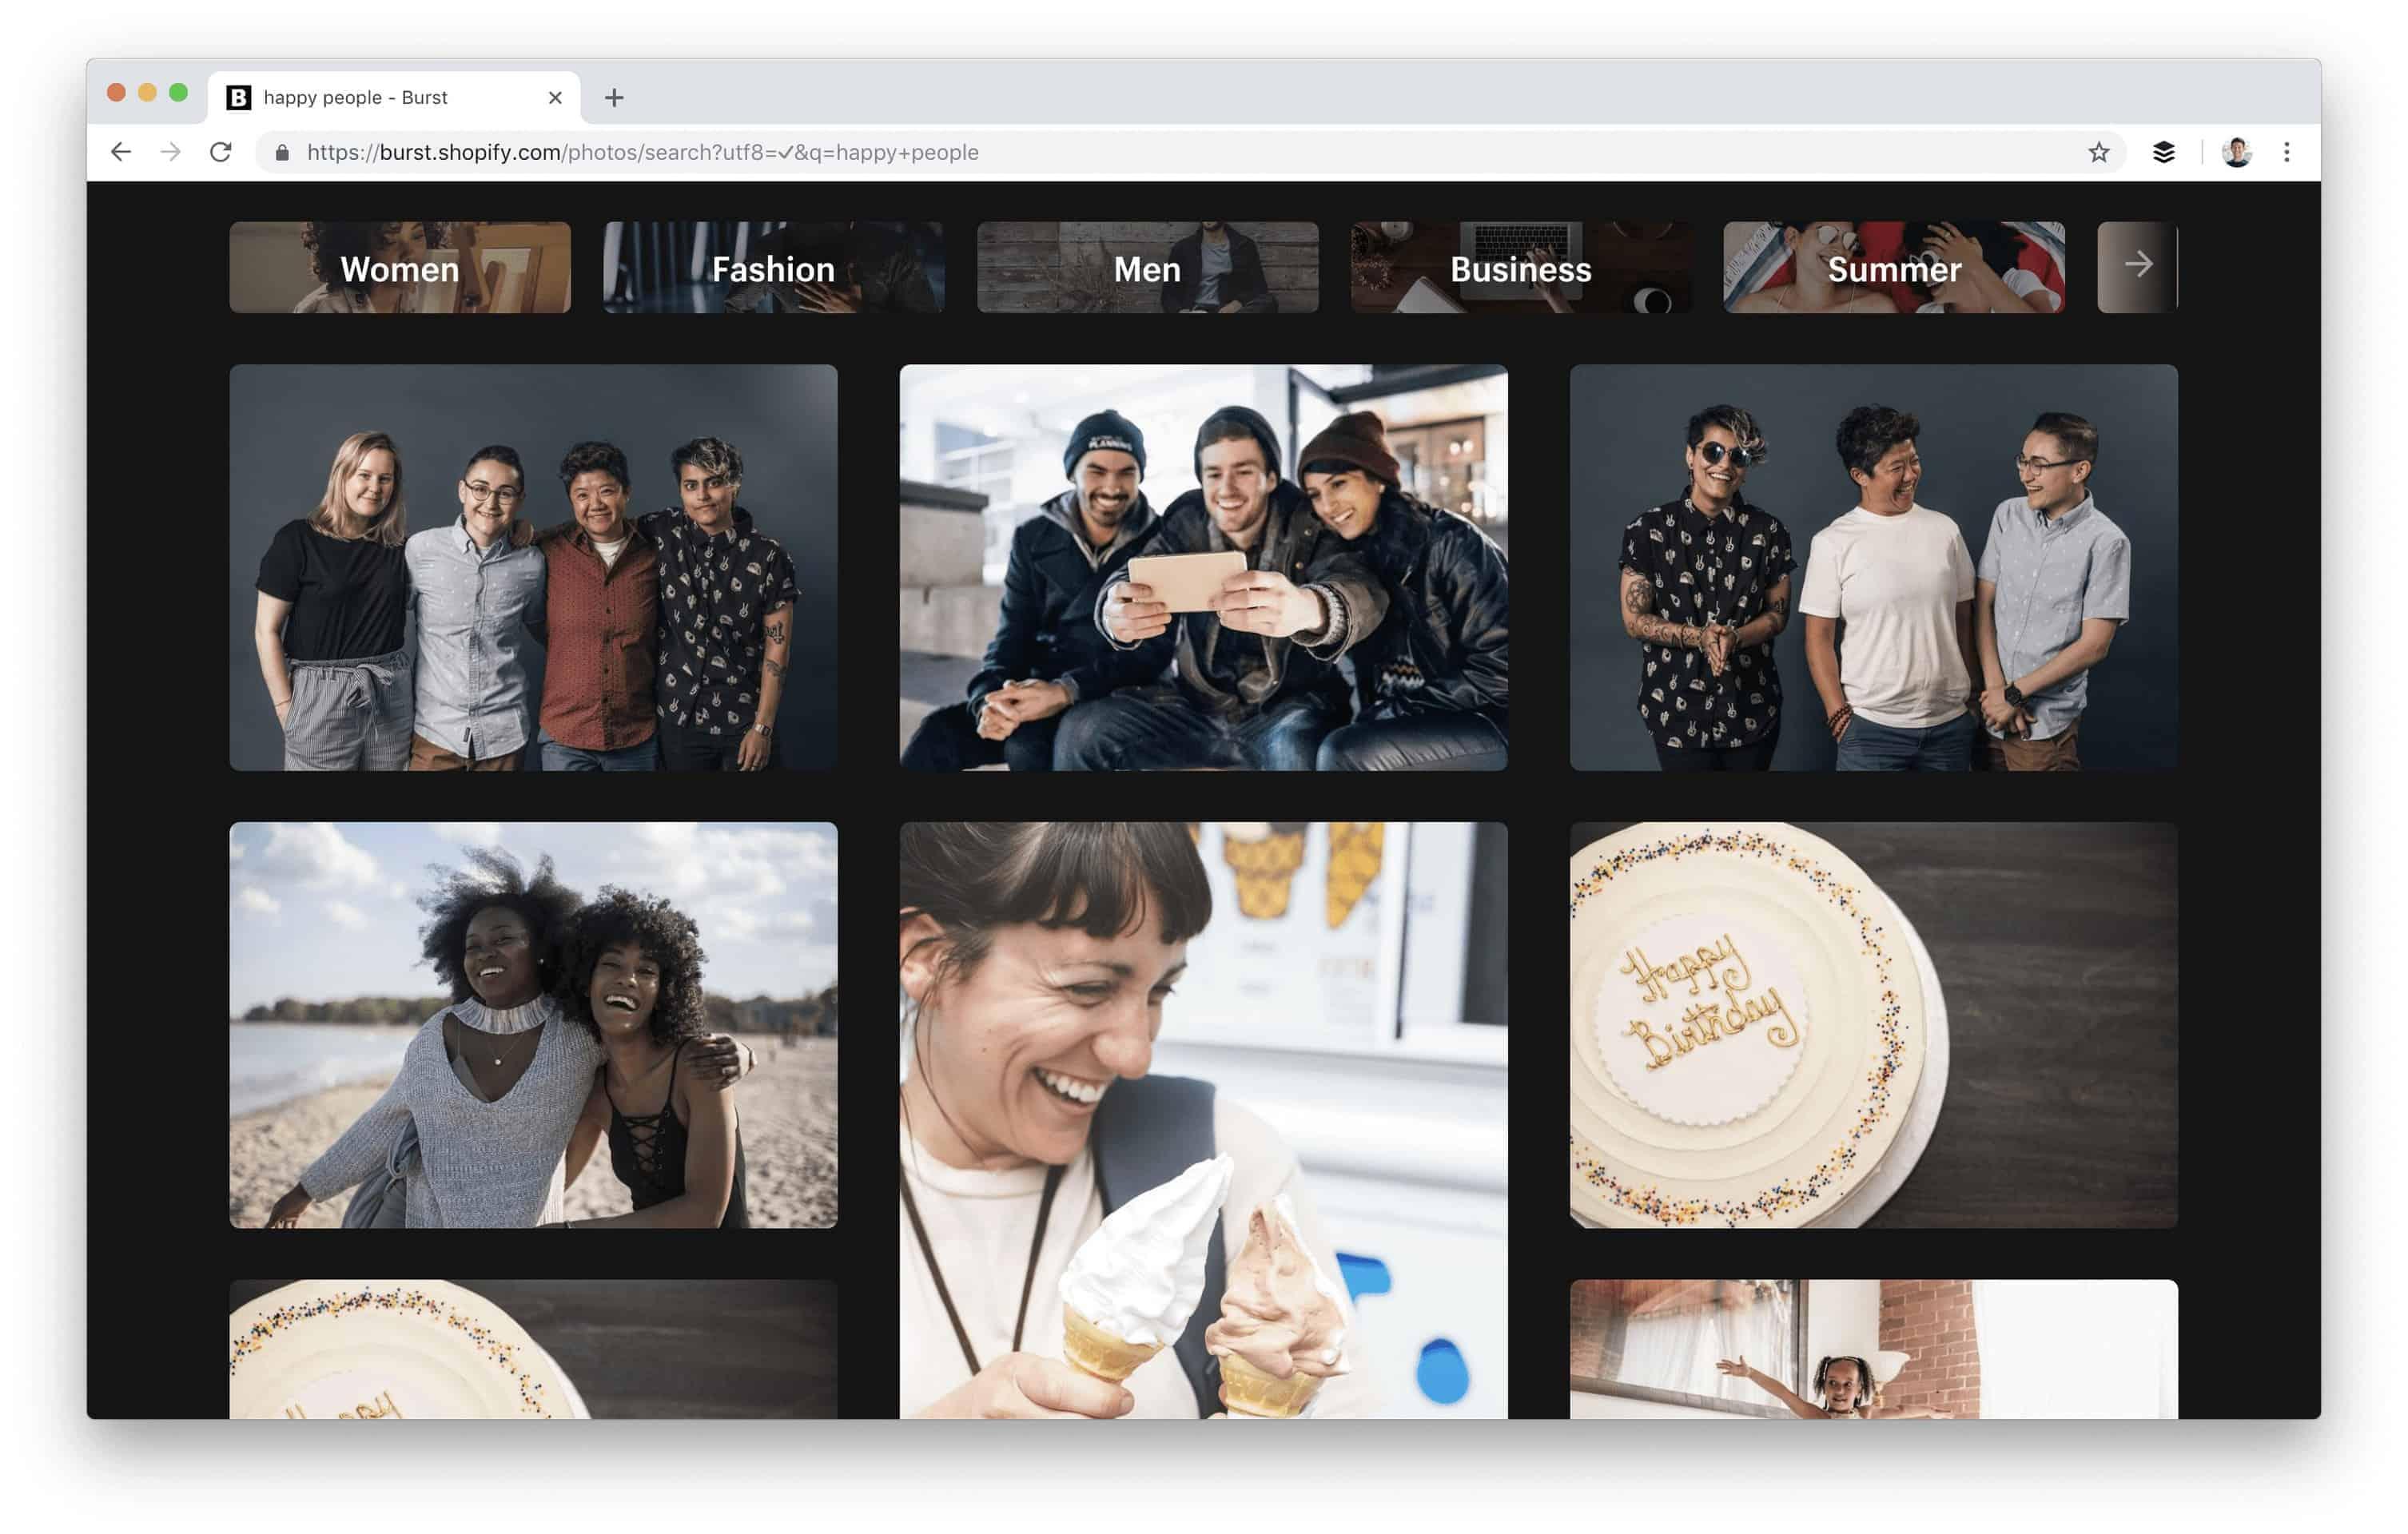 Burst אתרי תמונות בחינם ללא זכויות יוצרים